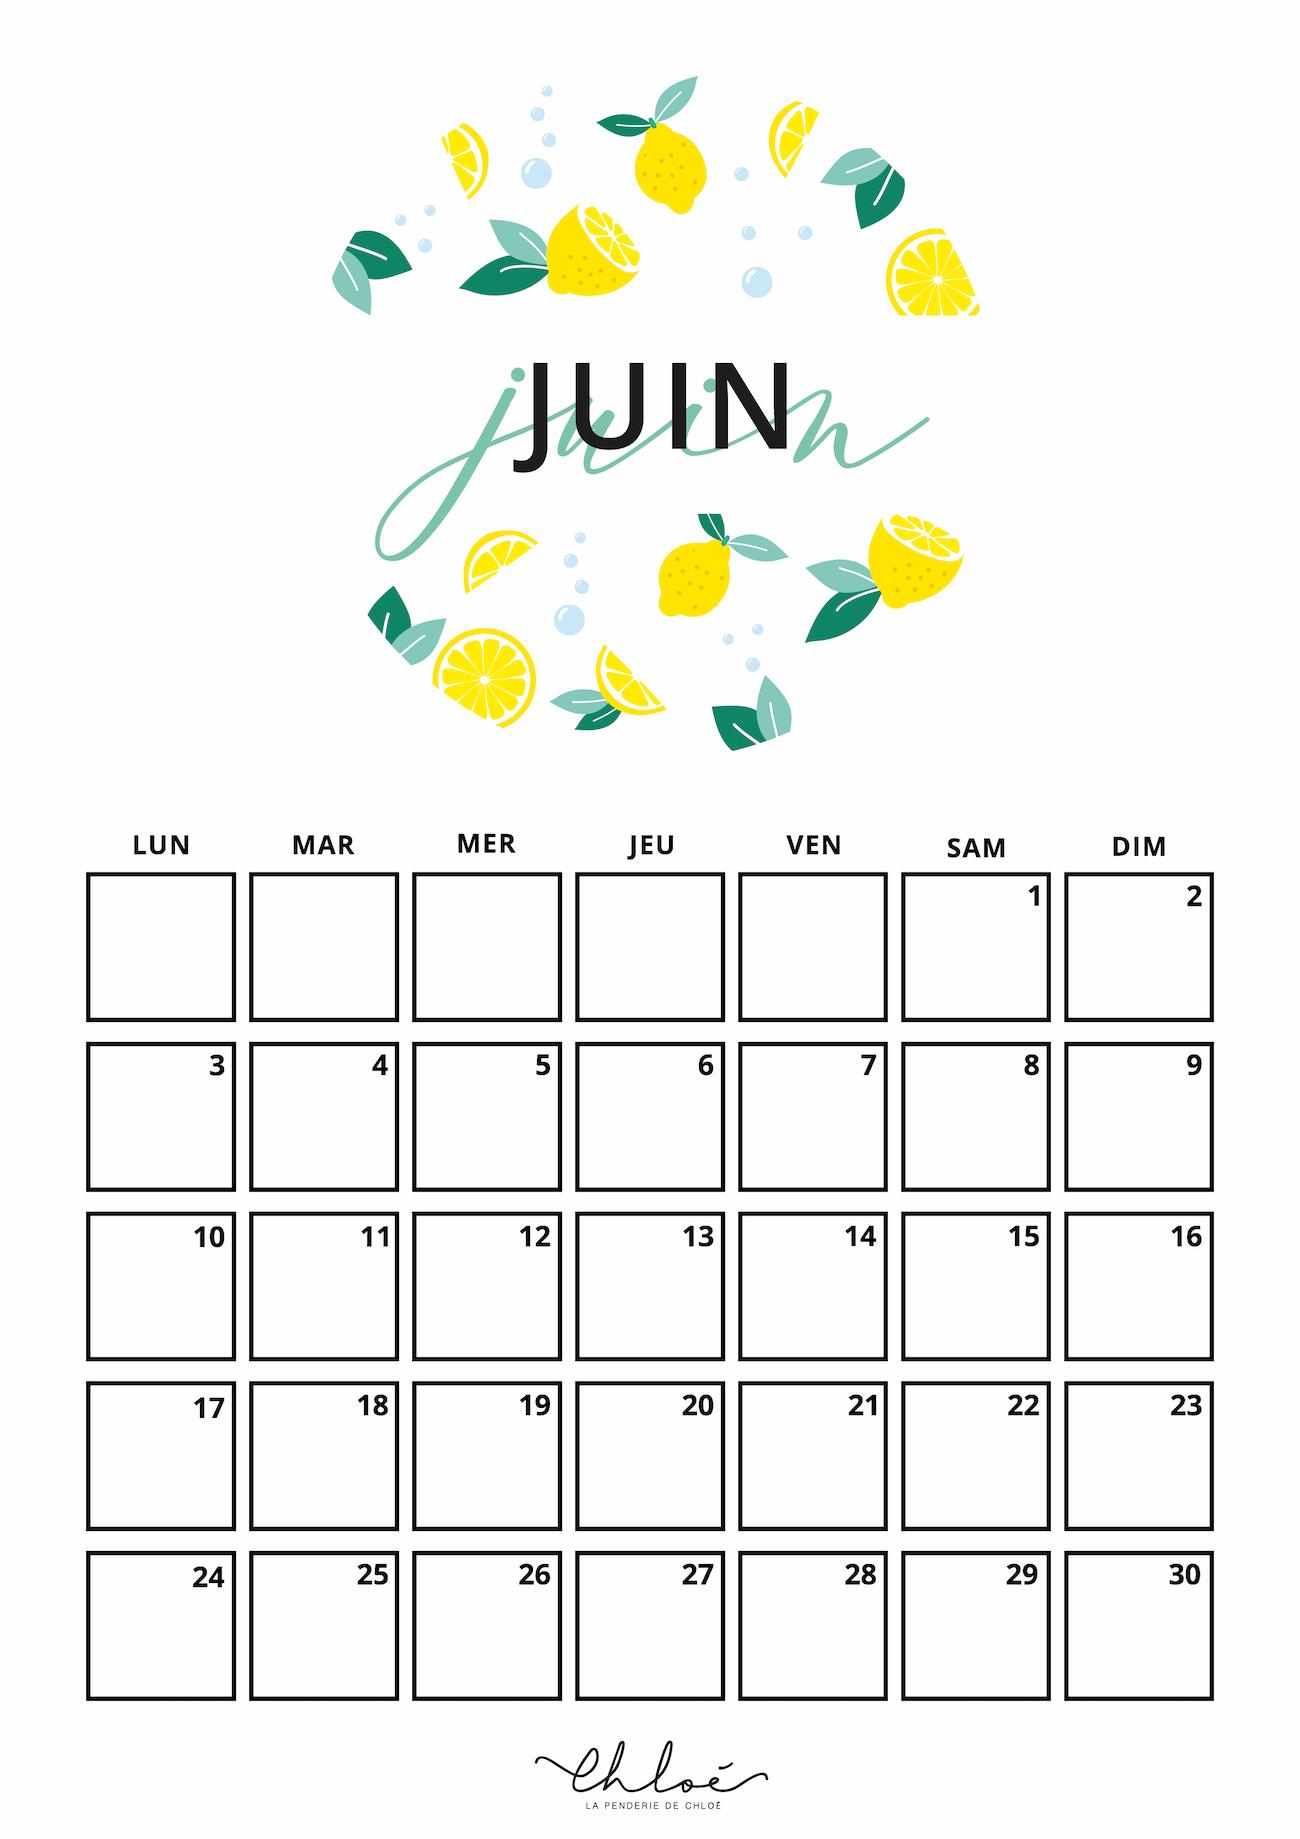 Calendrier Mensuel Juin 2019.Calendrier Juin A Imprimer La Penderie De Chloe Blog